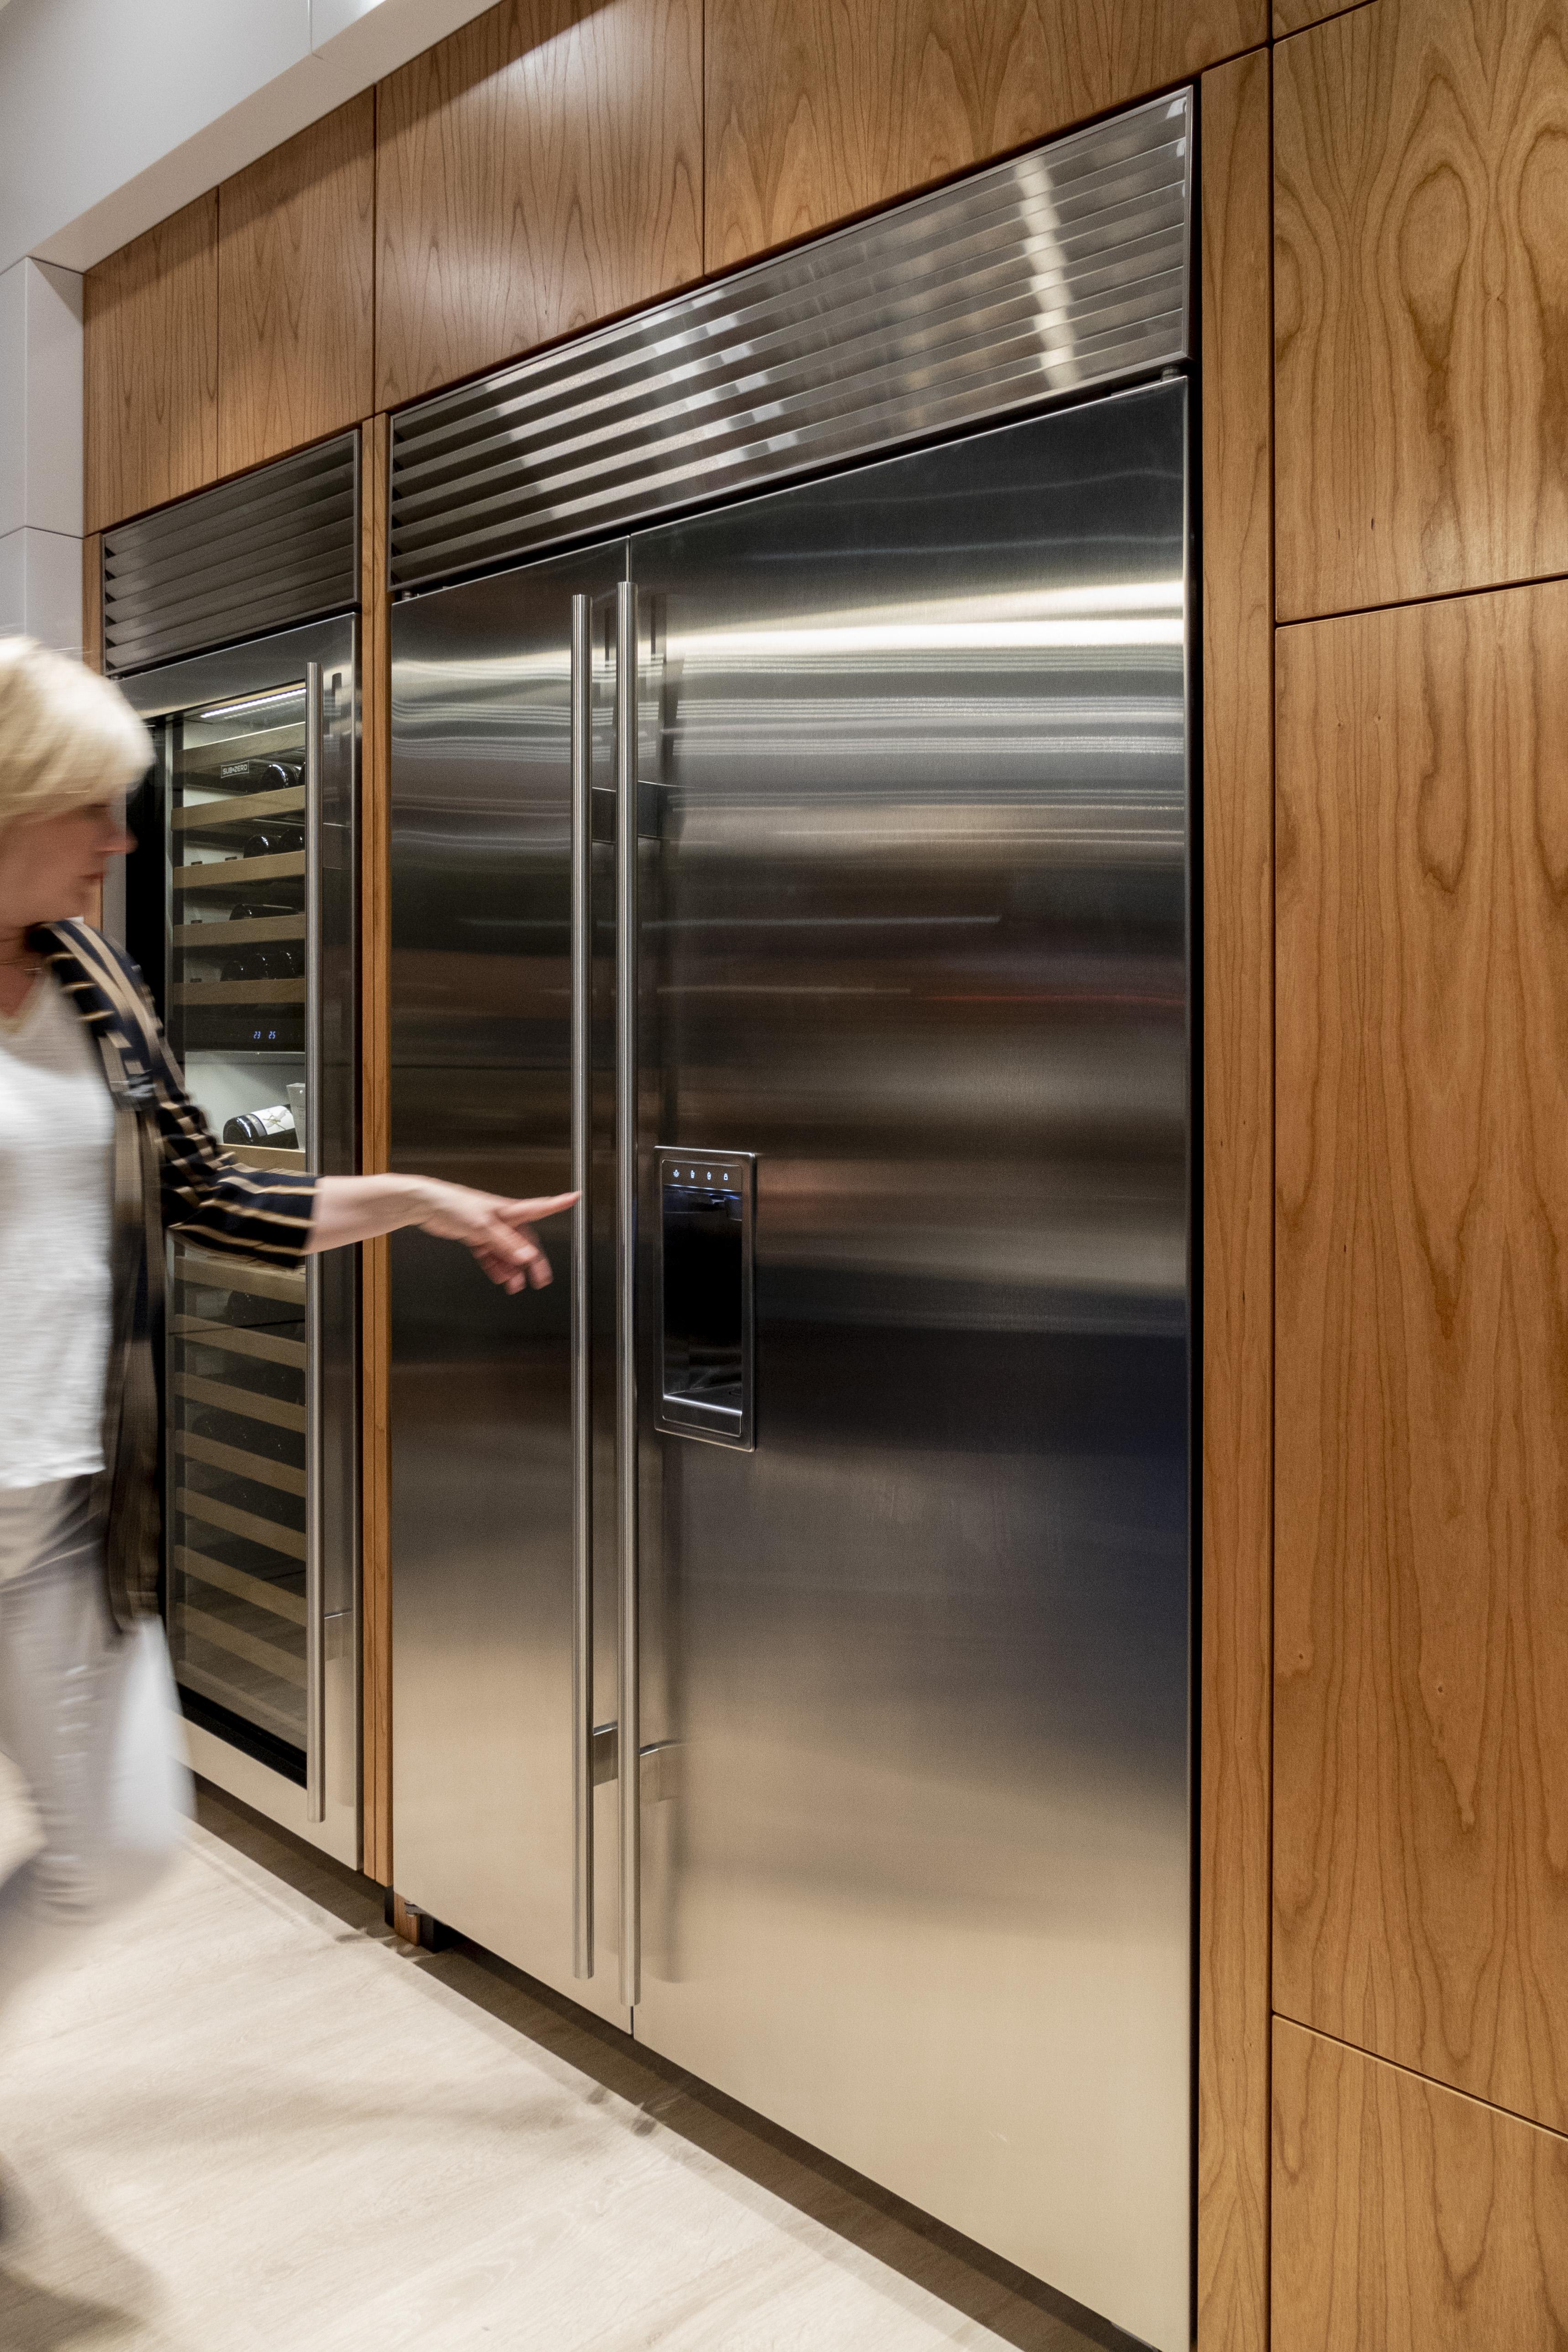 Cuisine Low Cost Mobalpa european-kitchen-design   european kitchen design blog